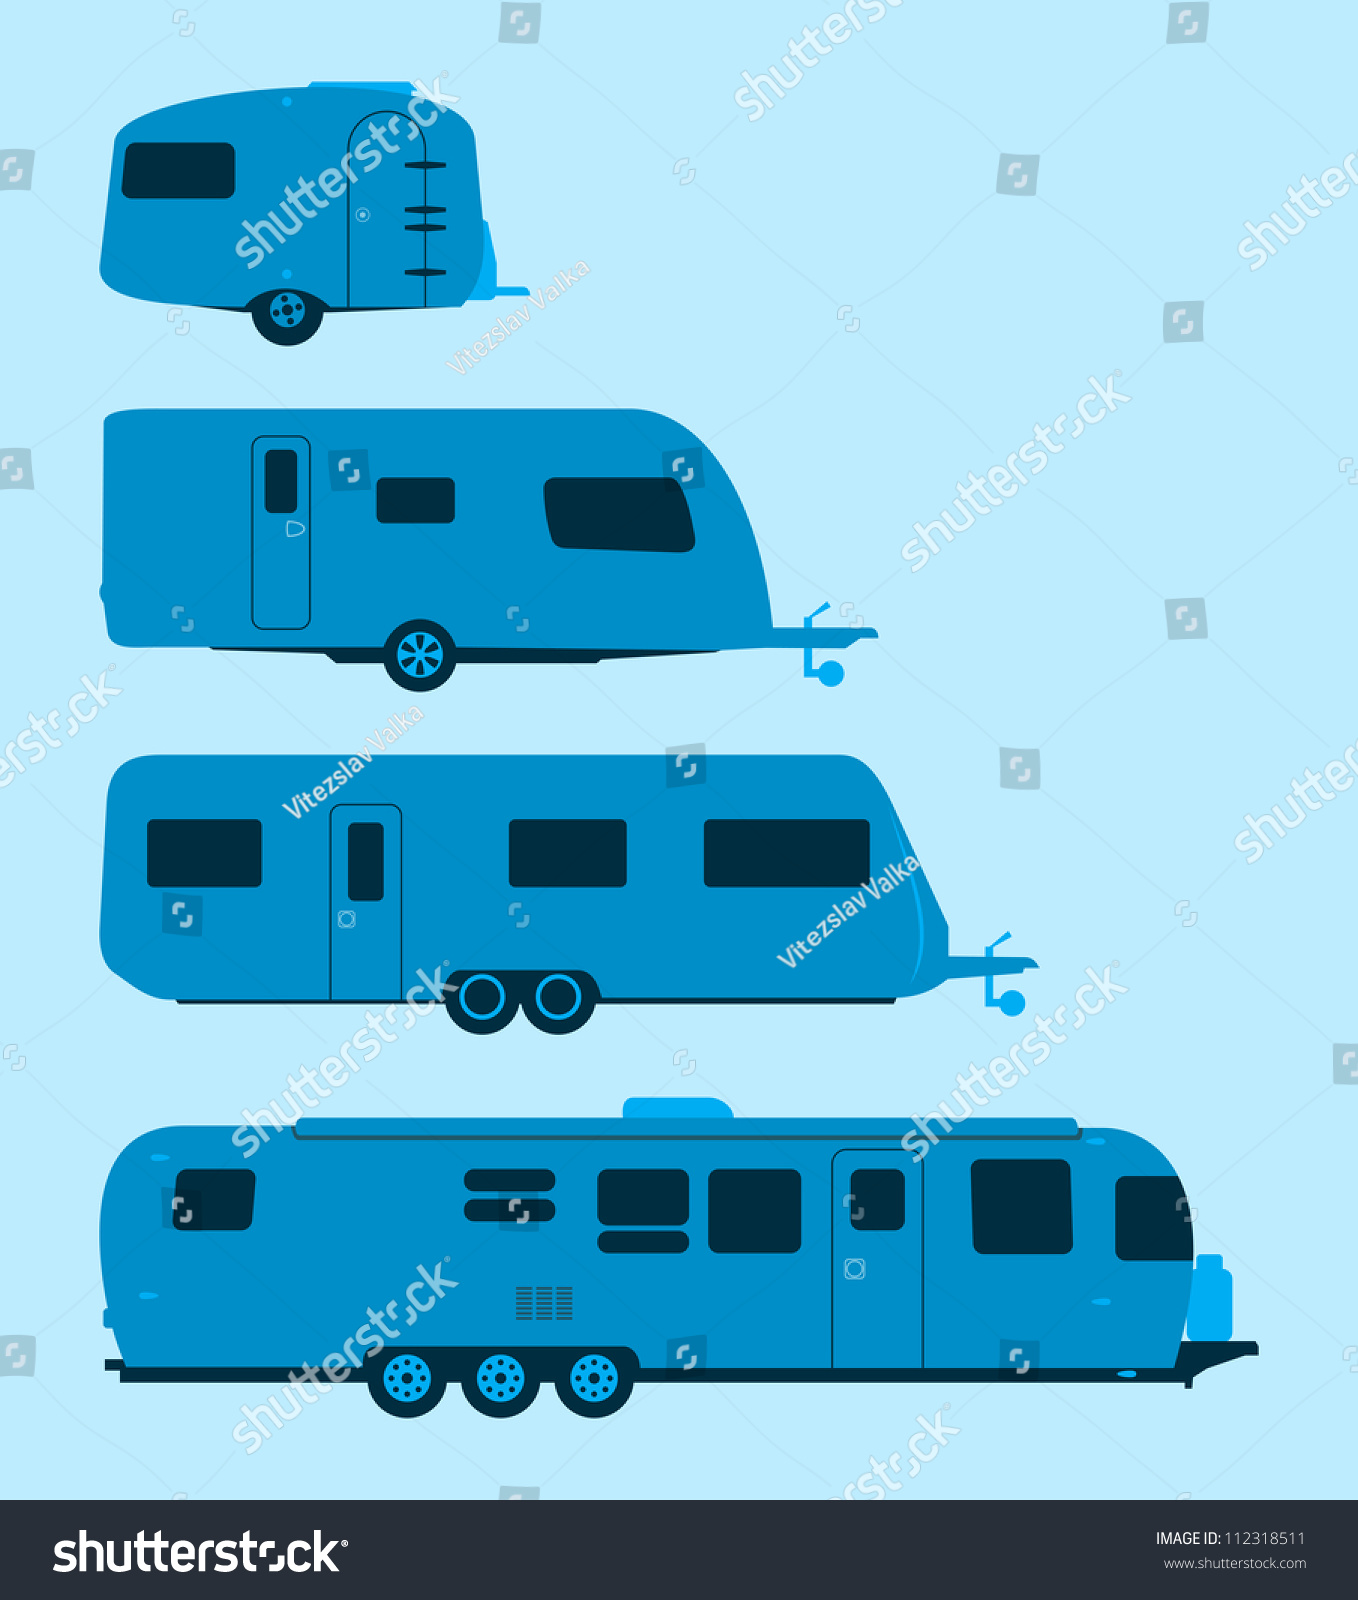 Caravan Silhouette Several Mobile Homes Illustration Stock Vector